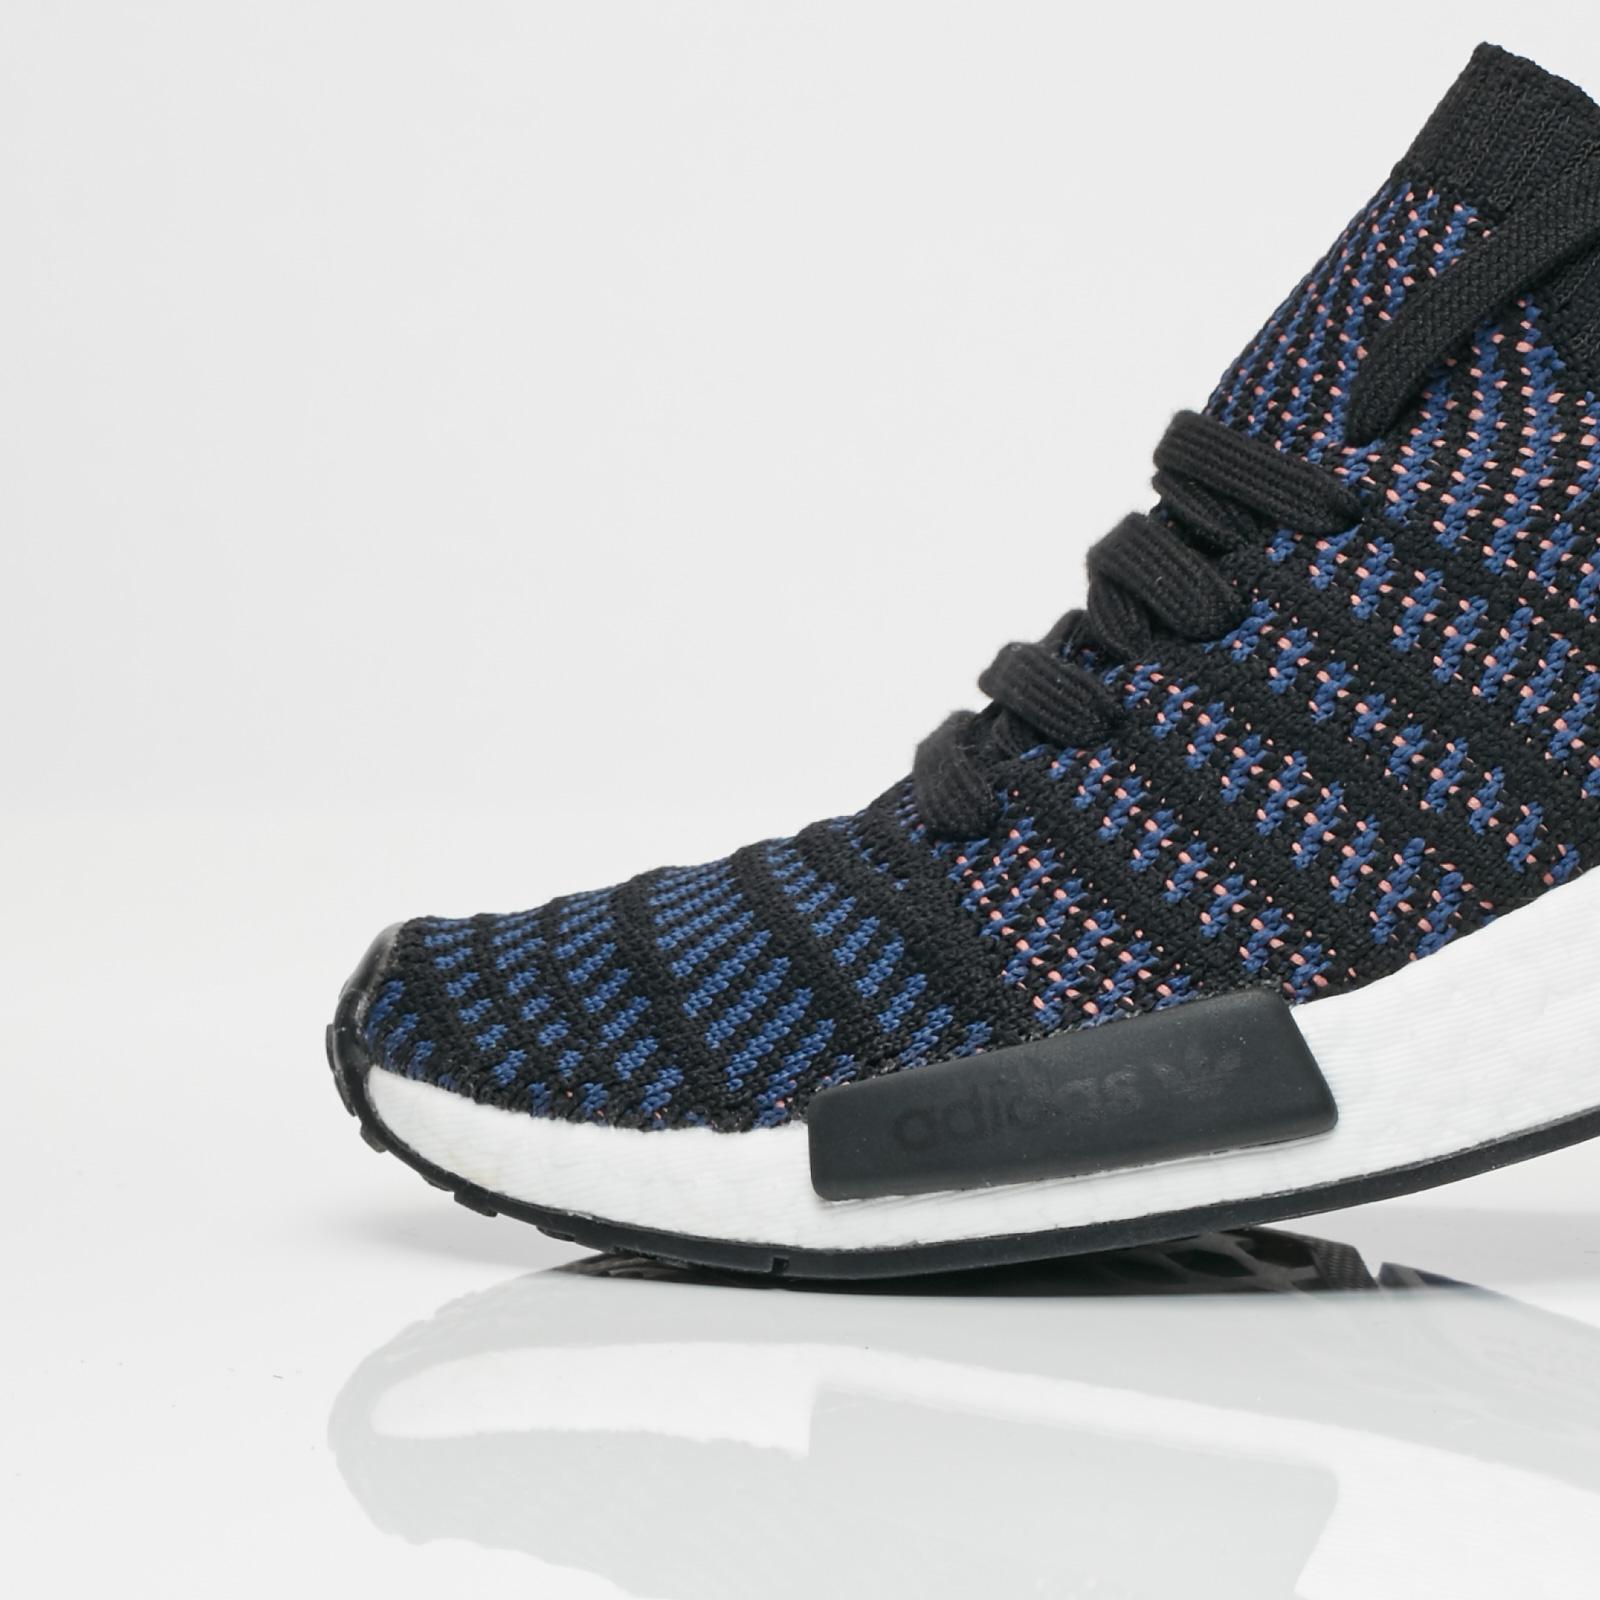 716607c53fb adidas NMD R1 STLT PK W - Ac8326 - Sneakersnstuff